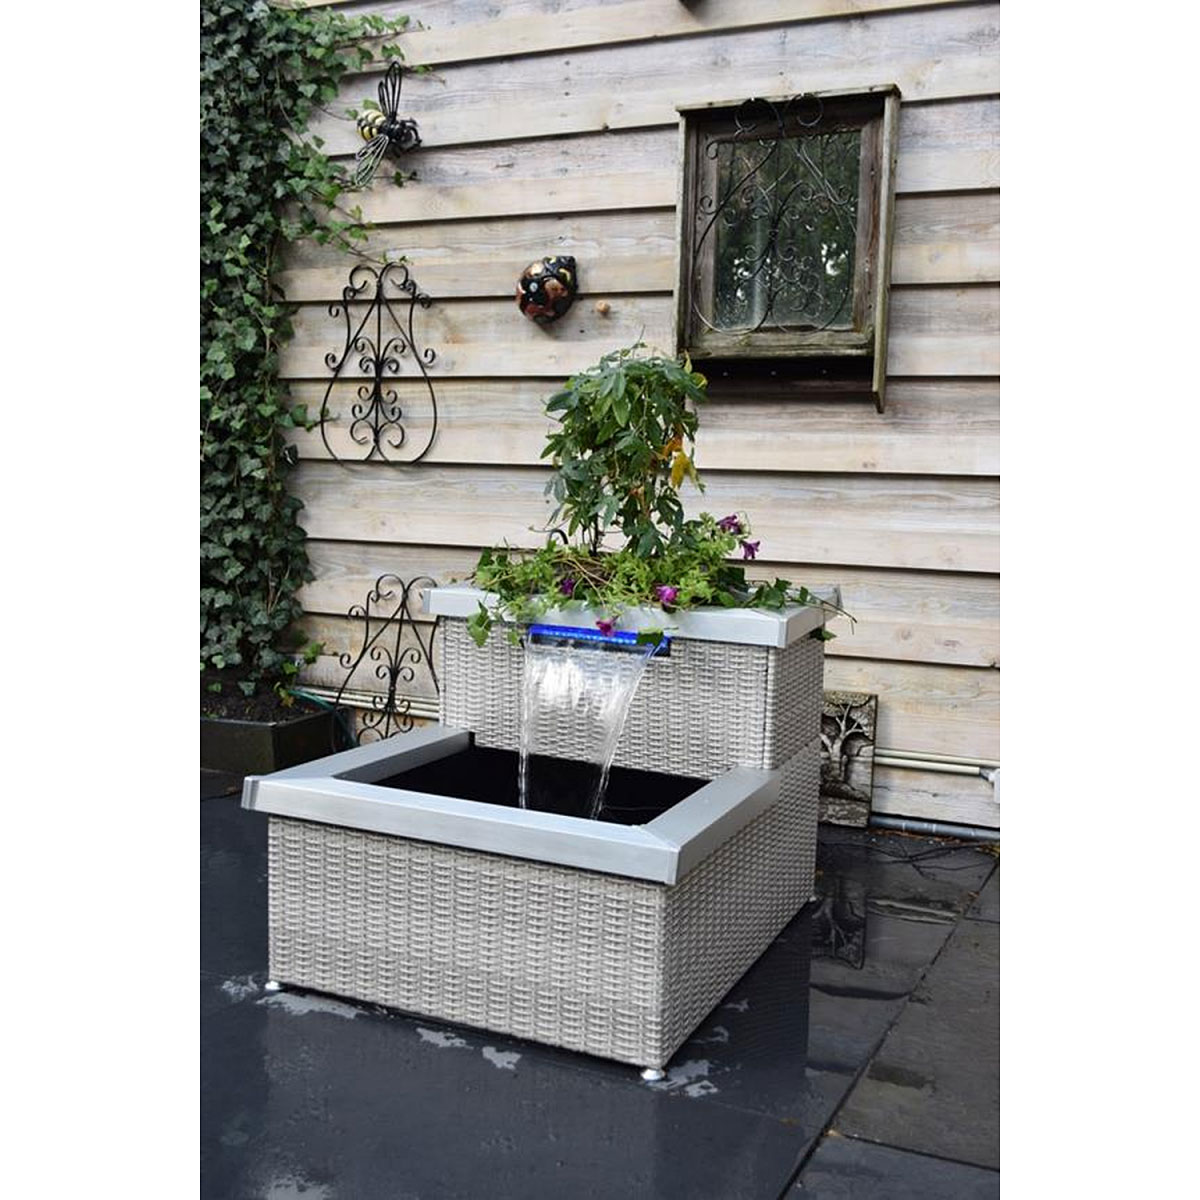 "Gartendekoration - Terassenteich ""Aveiro"", faltbar  - Onlineshop Hellweg"